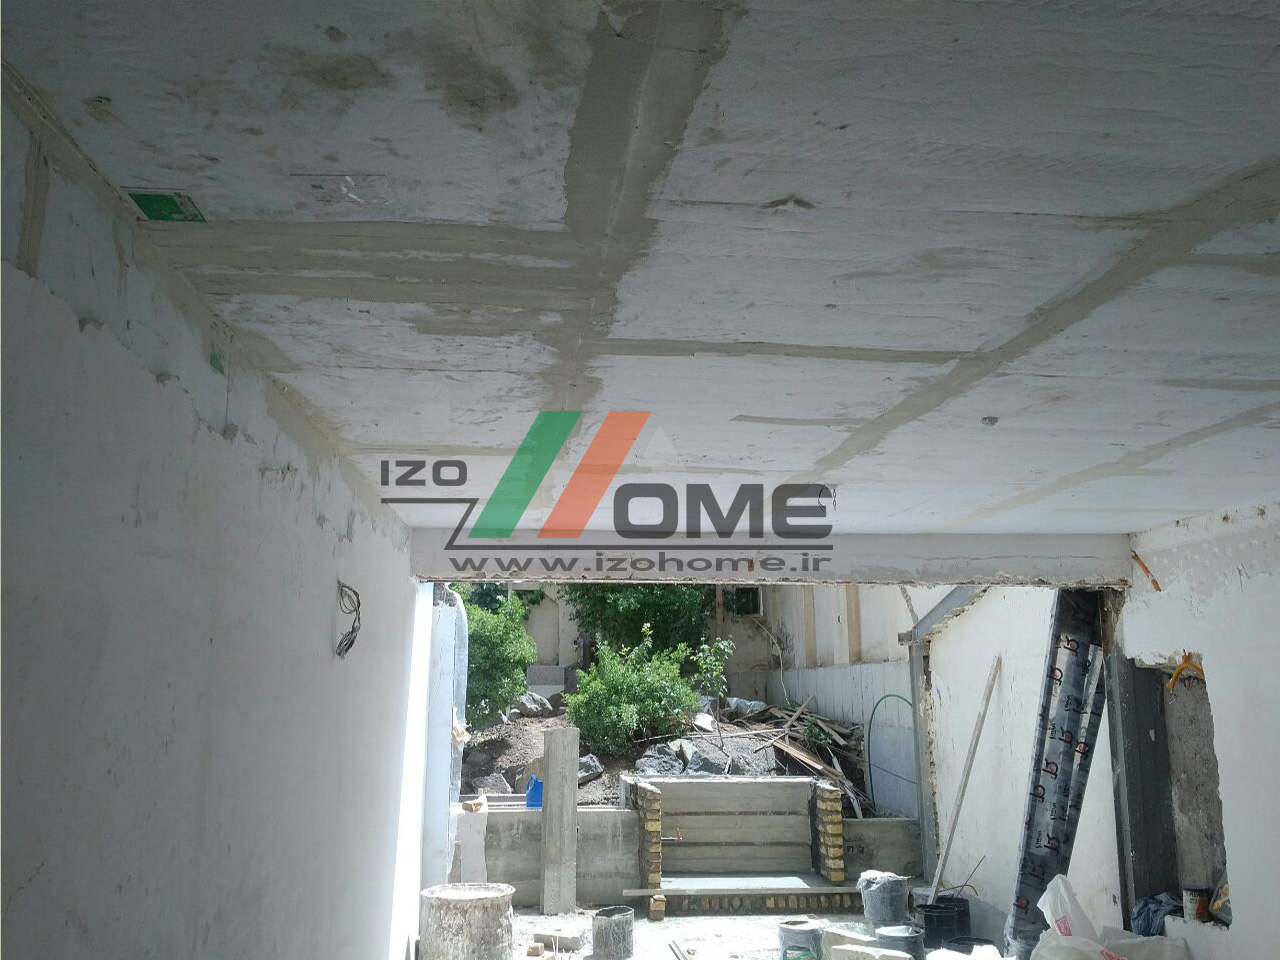 izohome45 - Sound insulation for the ceiling